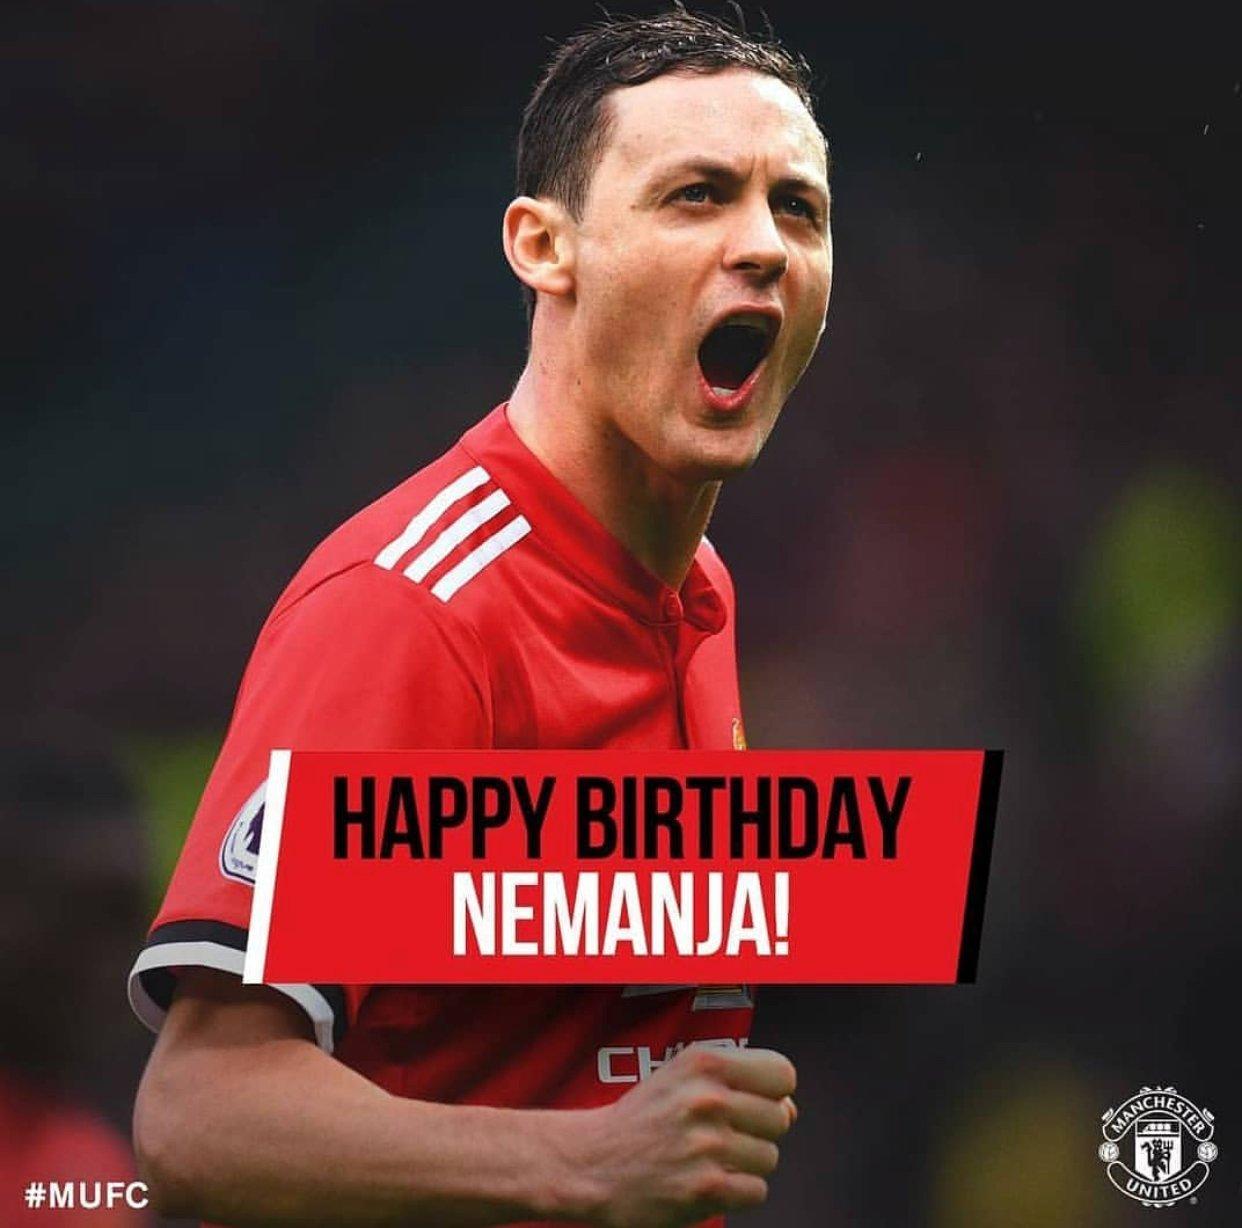 We wan wish Nemanja Matic Happy Birthday  God bless am!